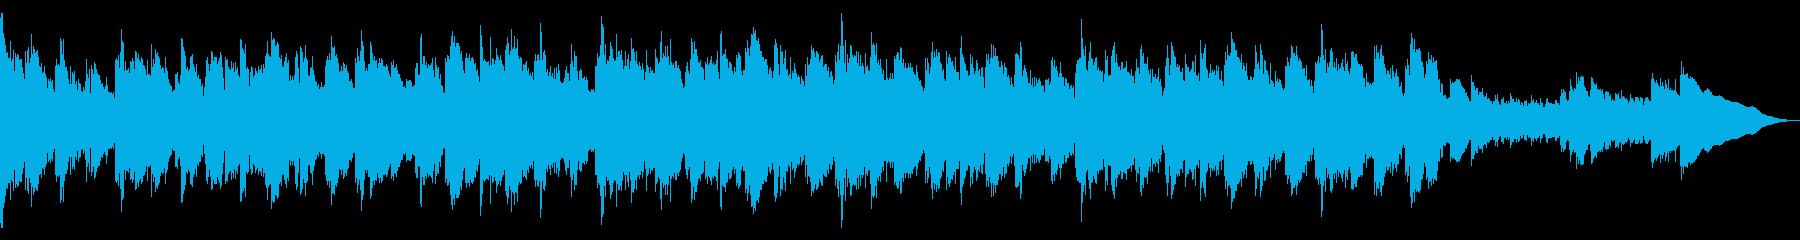 Lets Enjoy 60秒の再生済みの波形